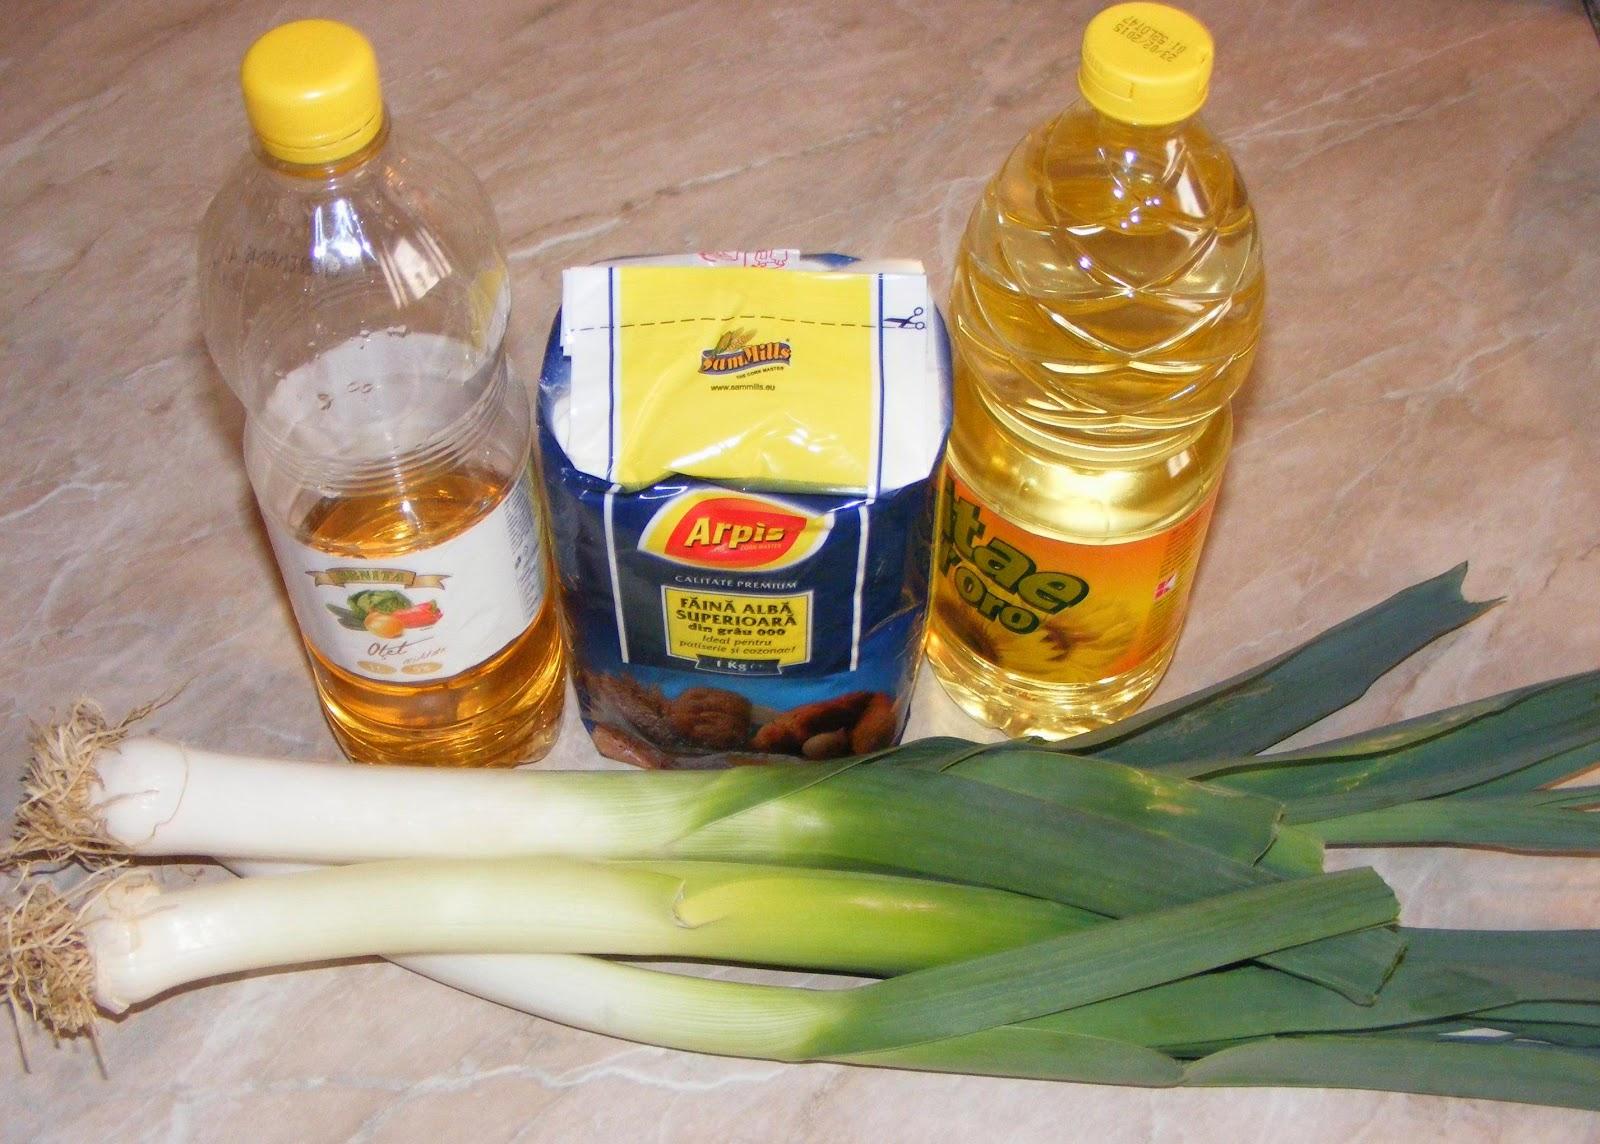 ingrediente pentru placinta cu praz, retete placinta cu praz, retete placinta, cum se prepara placinta cu praz, retete culinare, preparate culinare, retete de post, reteta placinta, cum se face placinta cu praz,